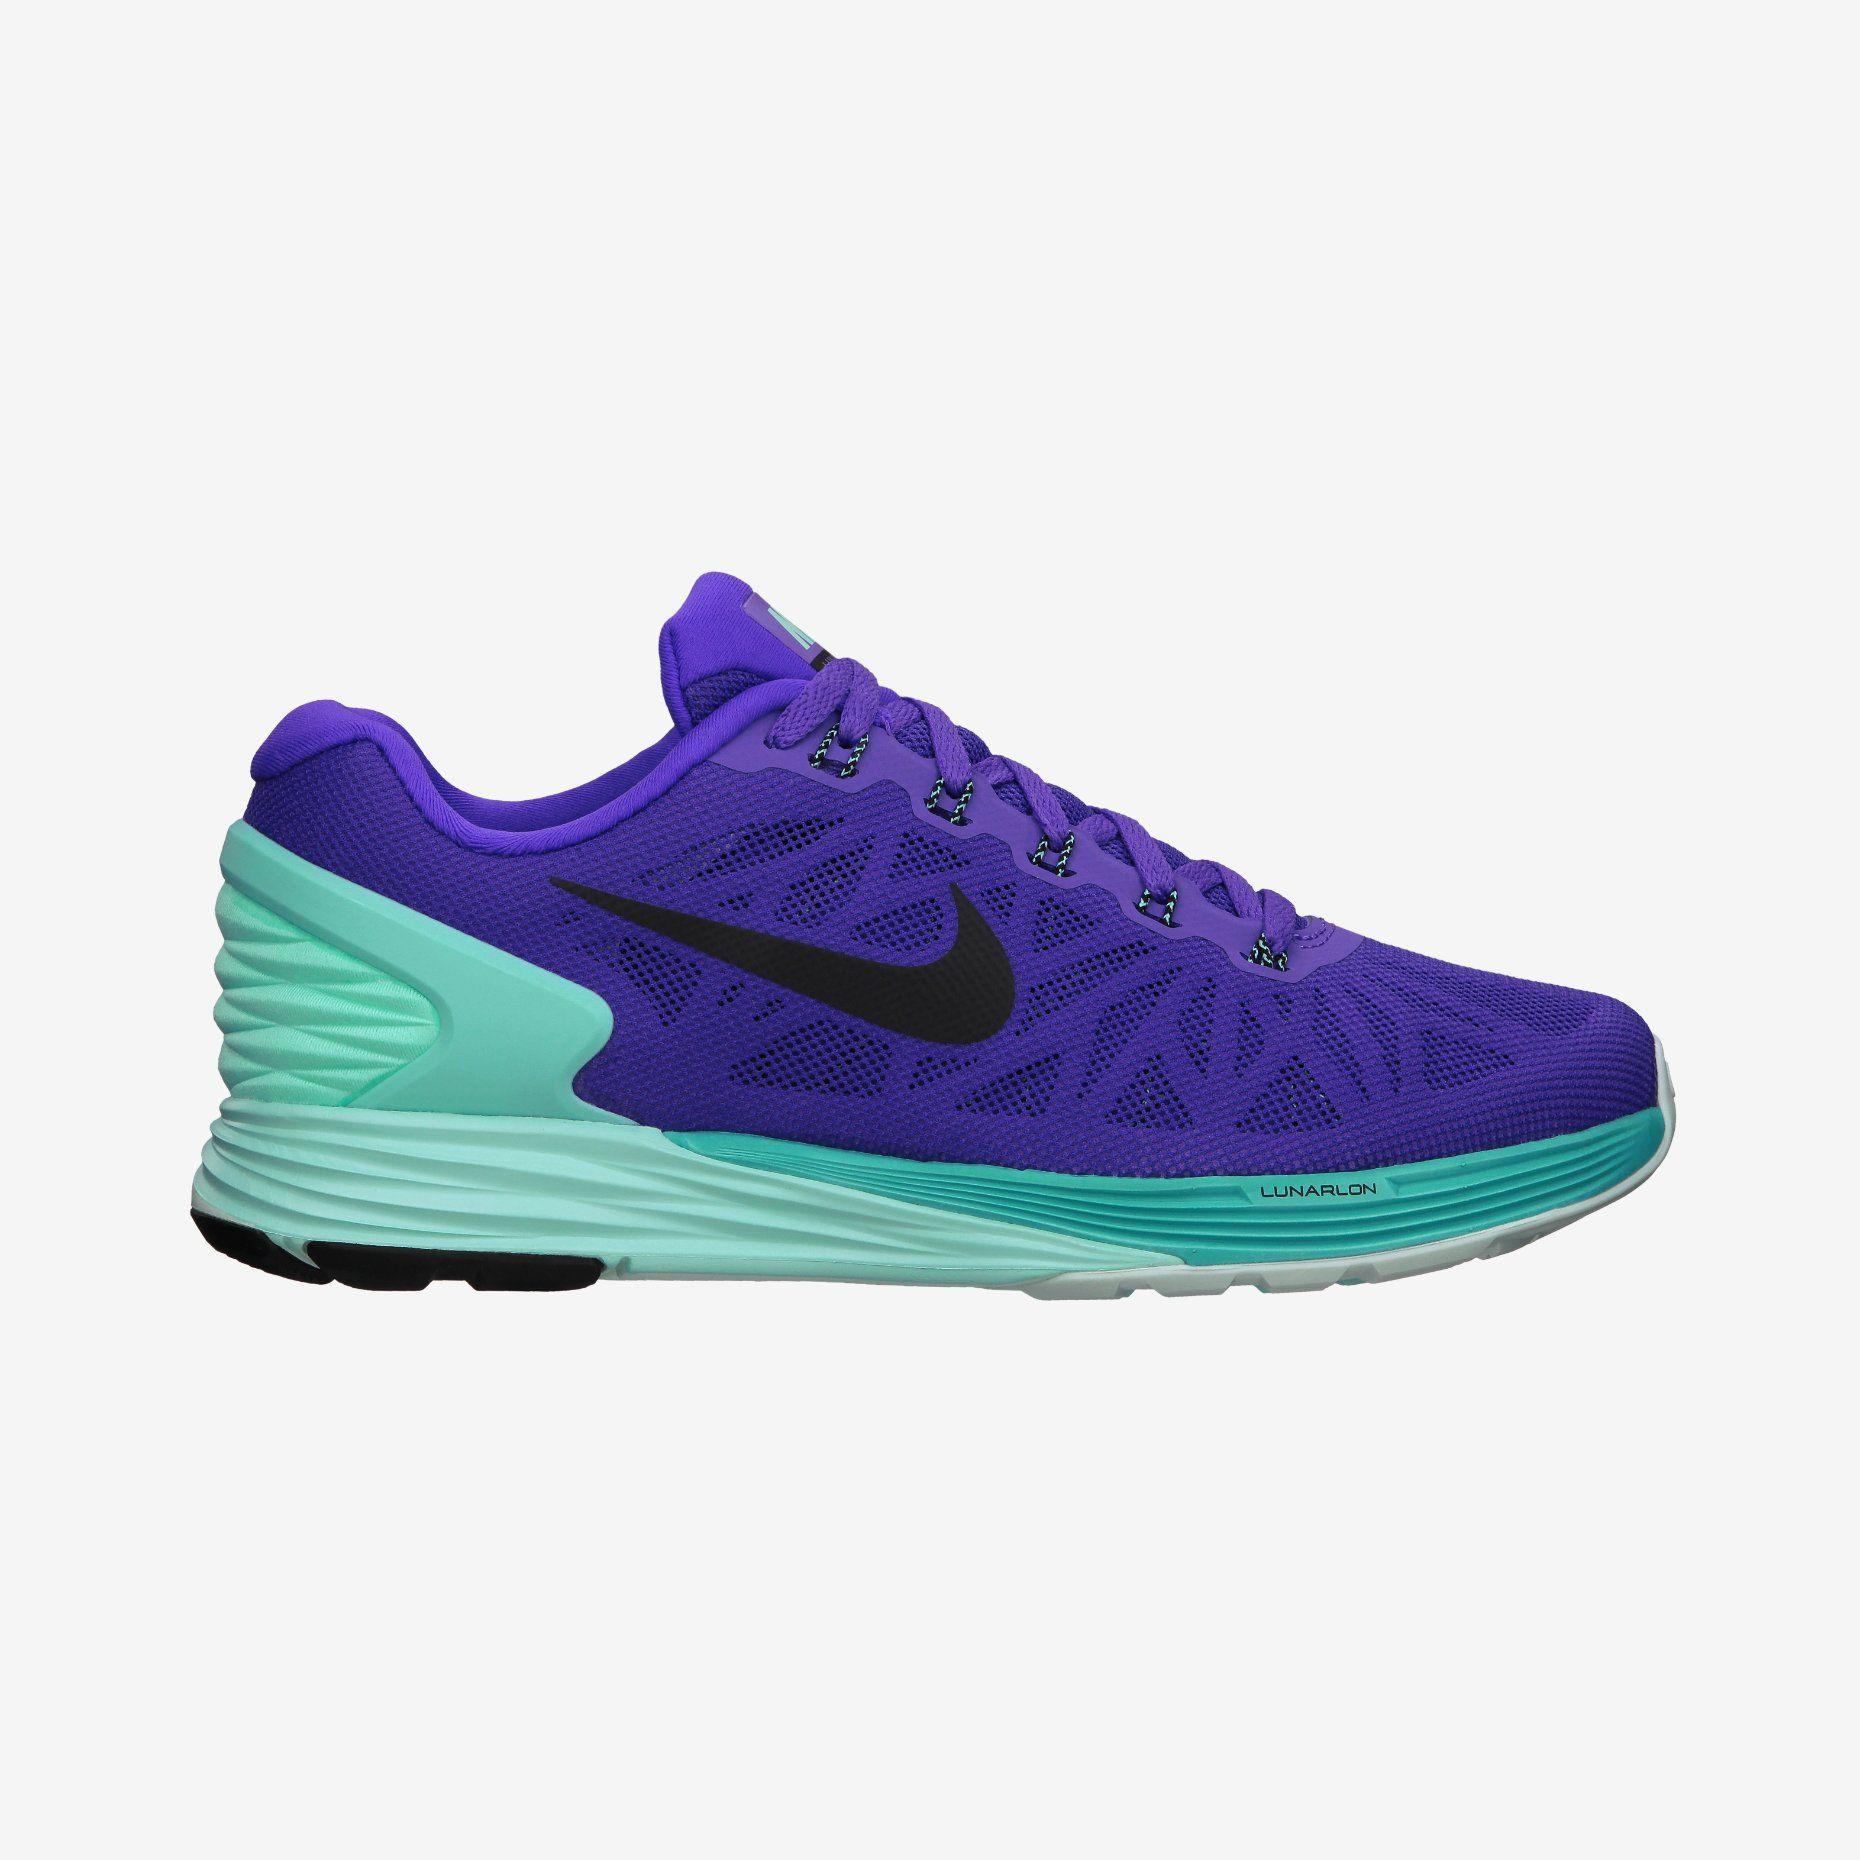 Nike LunarGlide 6 Women s Running Shoe  28fc77d5b59